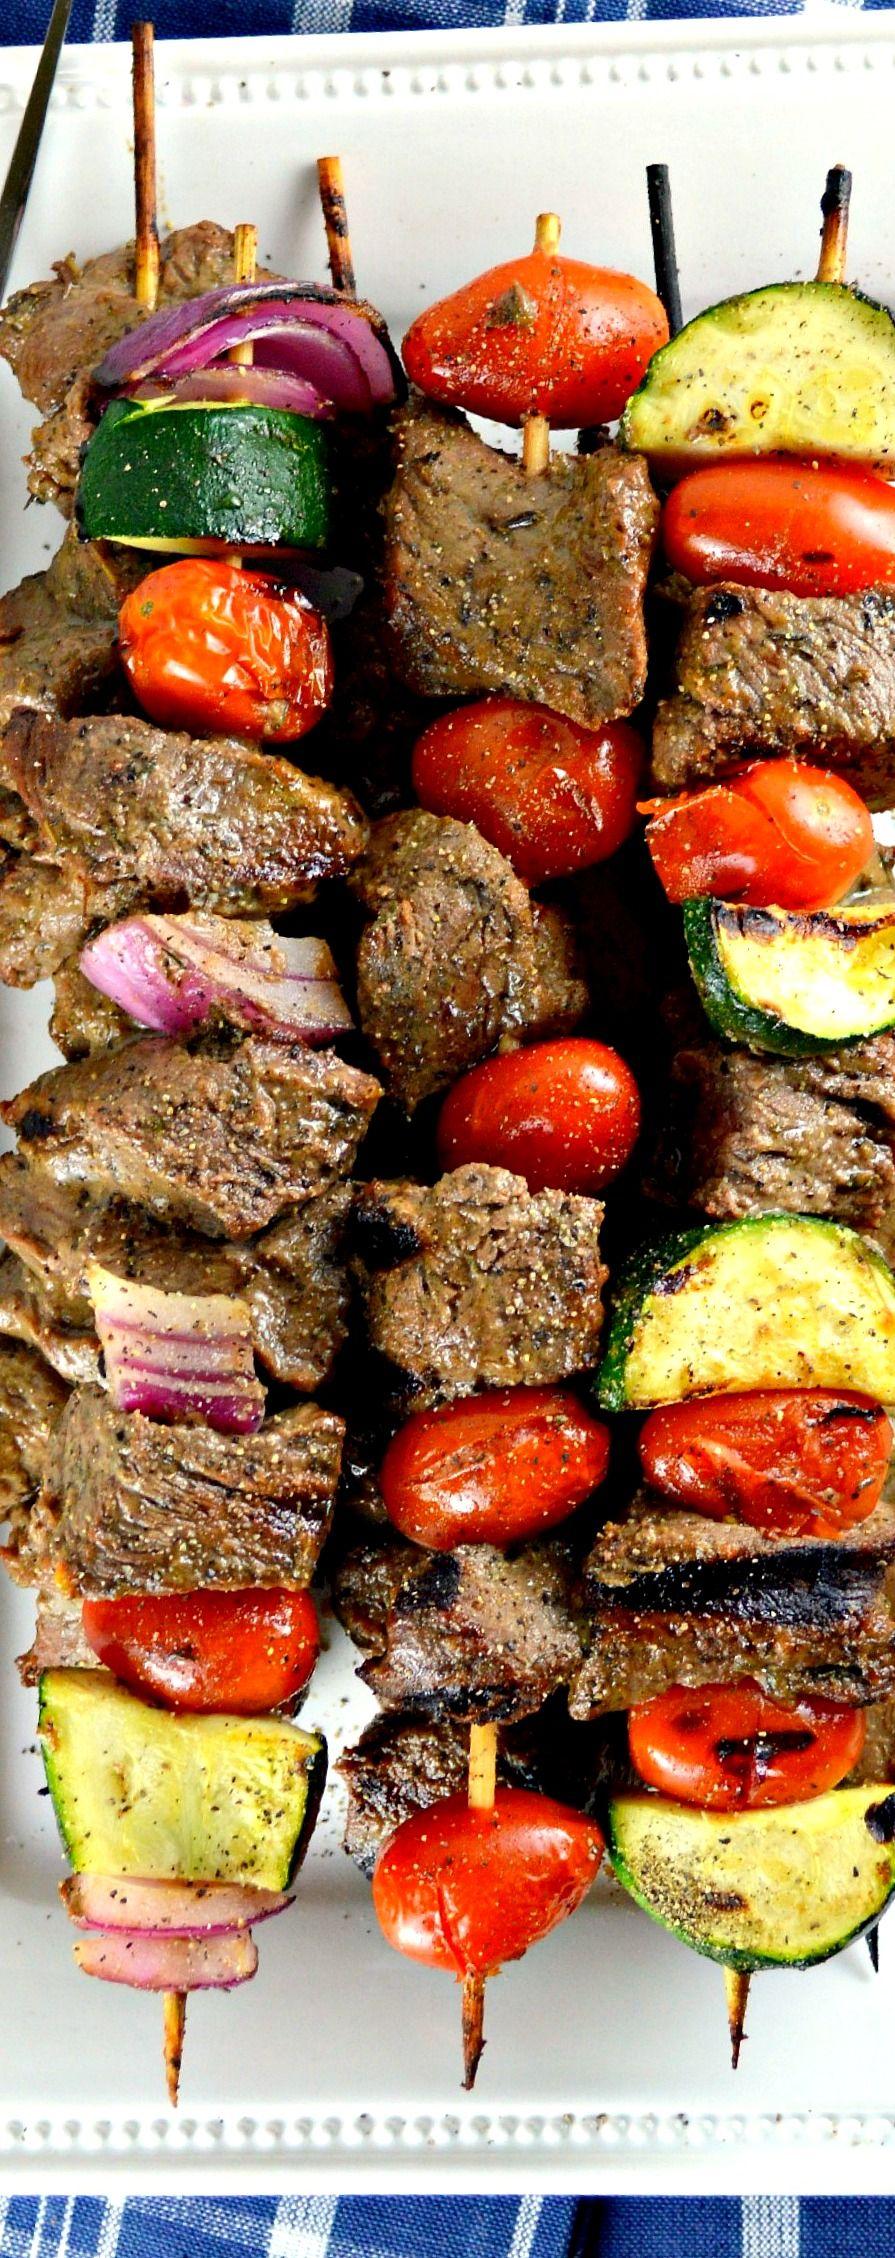 Shish Kabob   Recipe   Food, Shish kabobs, Kabob recipes